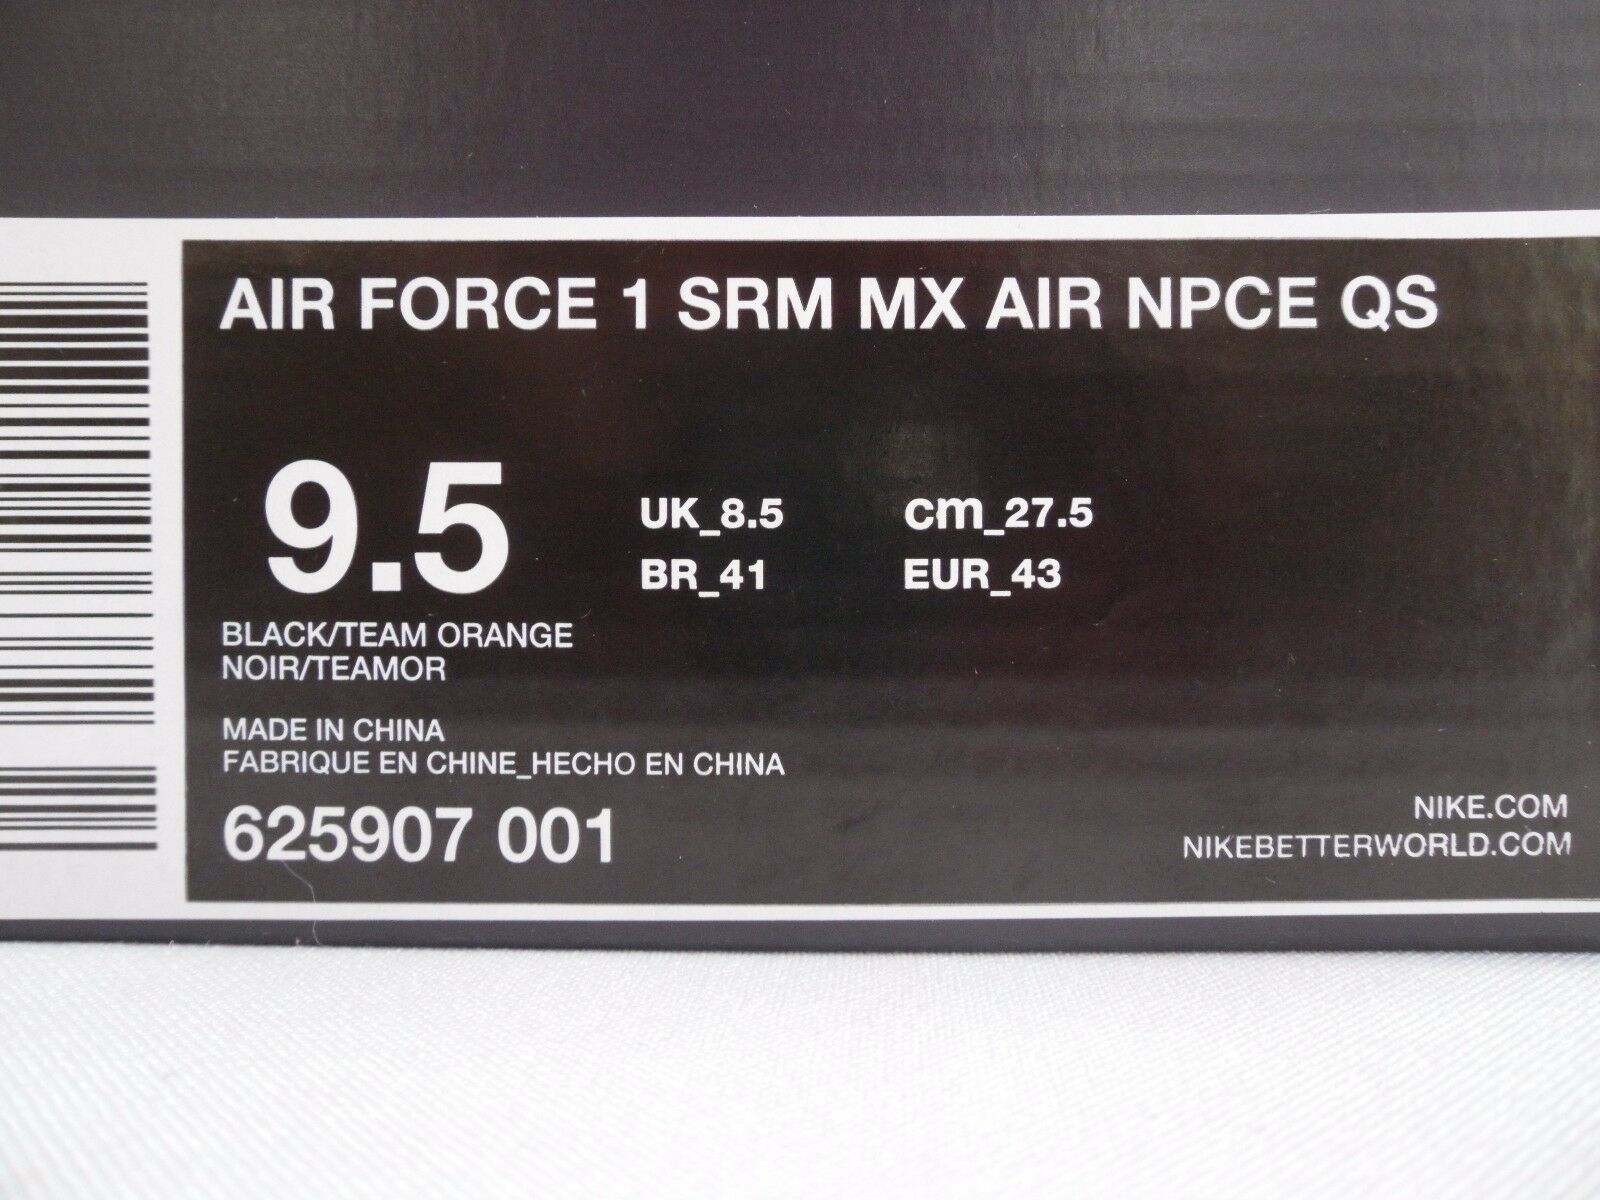 NIKE AIR FORCE 1 SUPREME MAX AIR NPCE NPCE NPCE QS ELEPHANT PRINT SZ 9.5 [625907-001] 4b1fa8